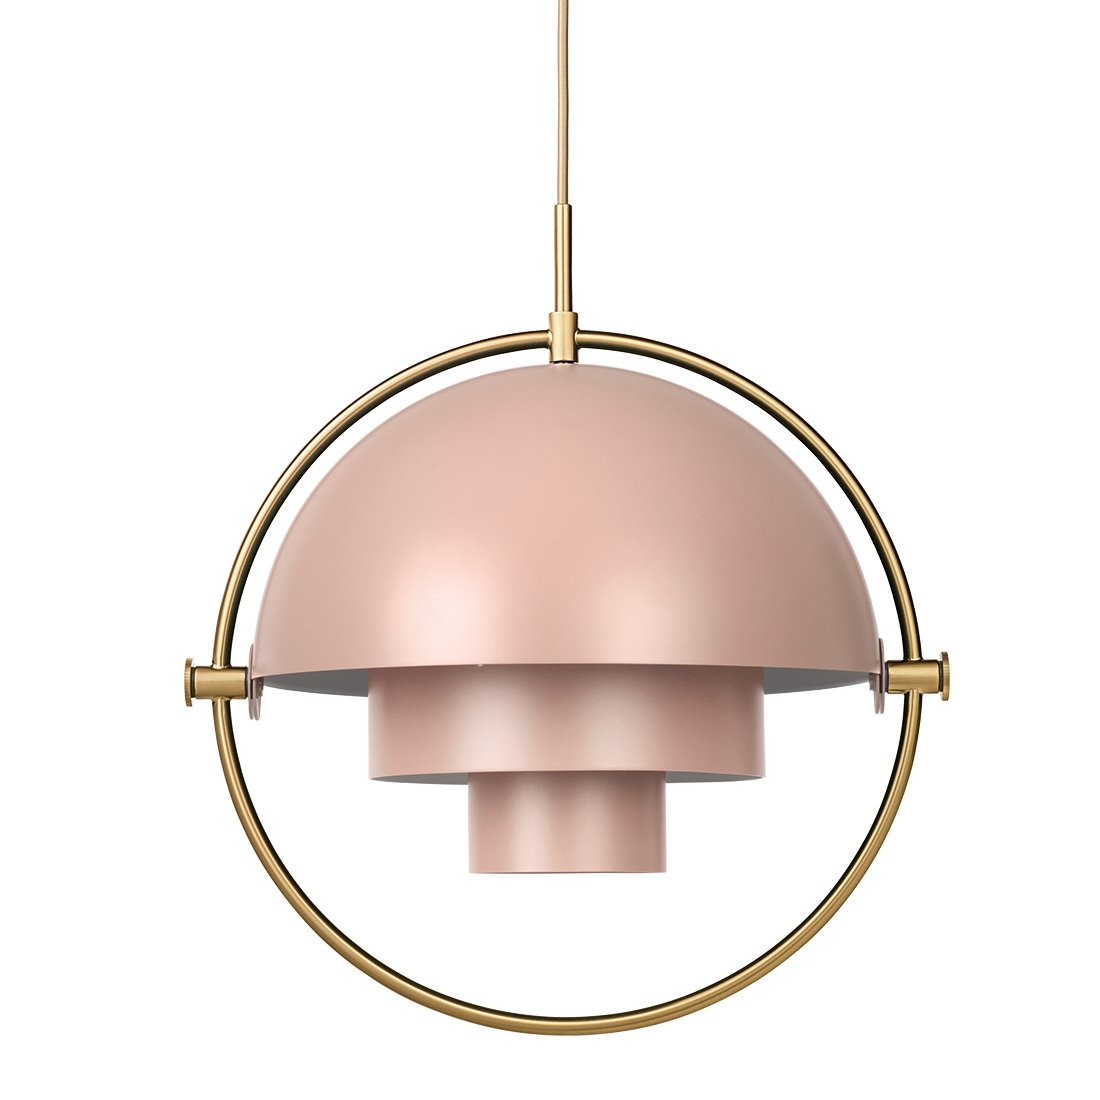 Gubi Multi-Lite Hanglamp Messing - Rose Dust